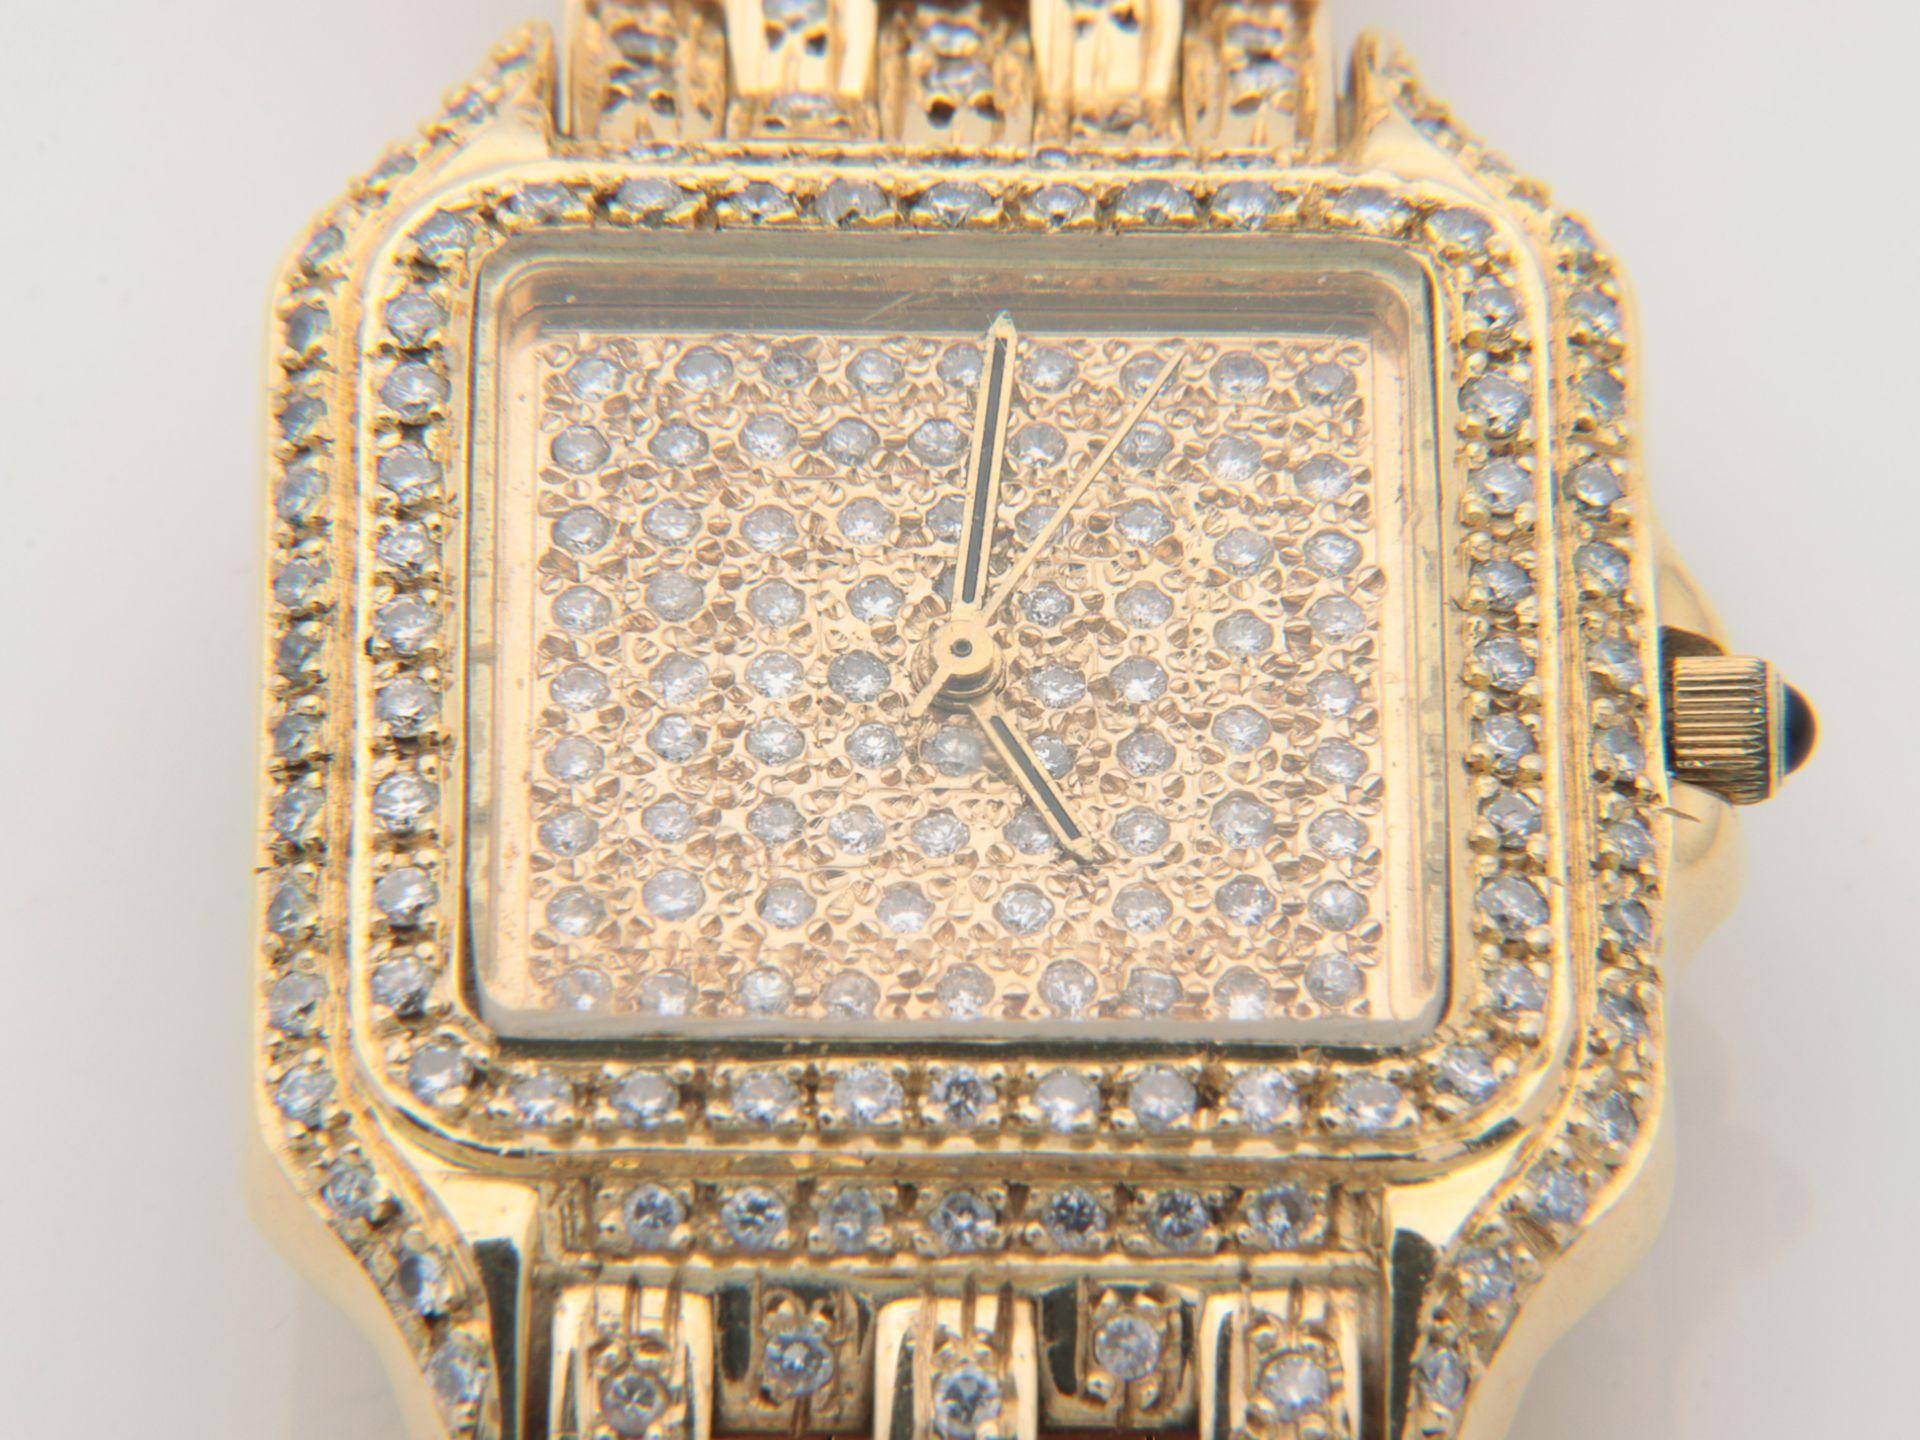 Cartier - Damenarmbanduhr - Image 3 of 14